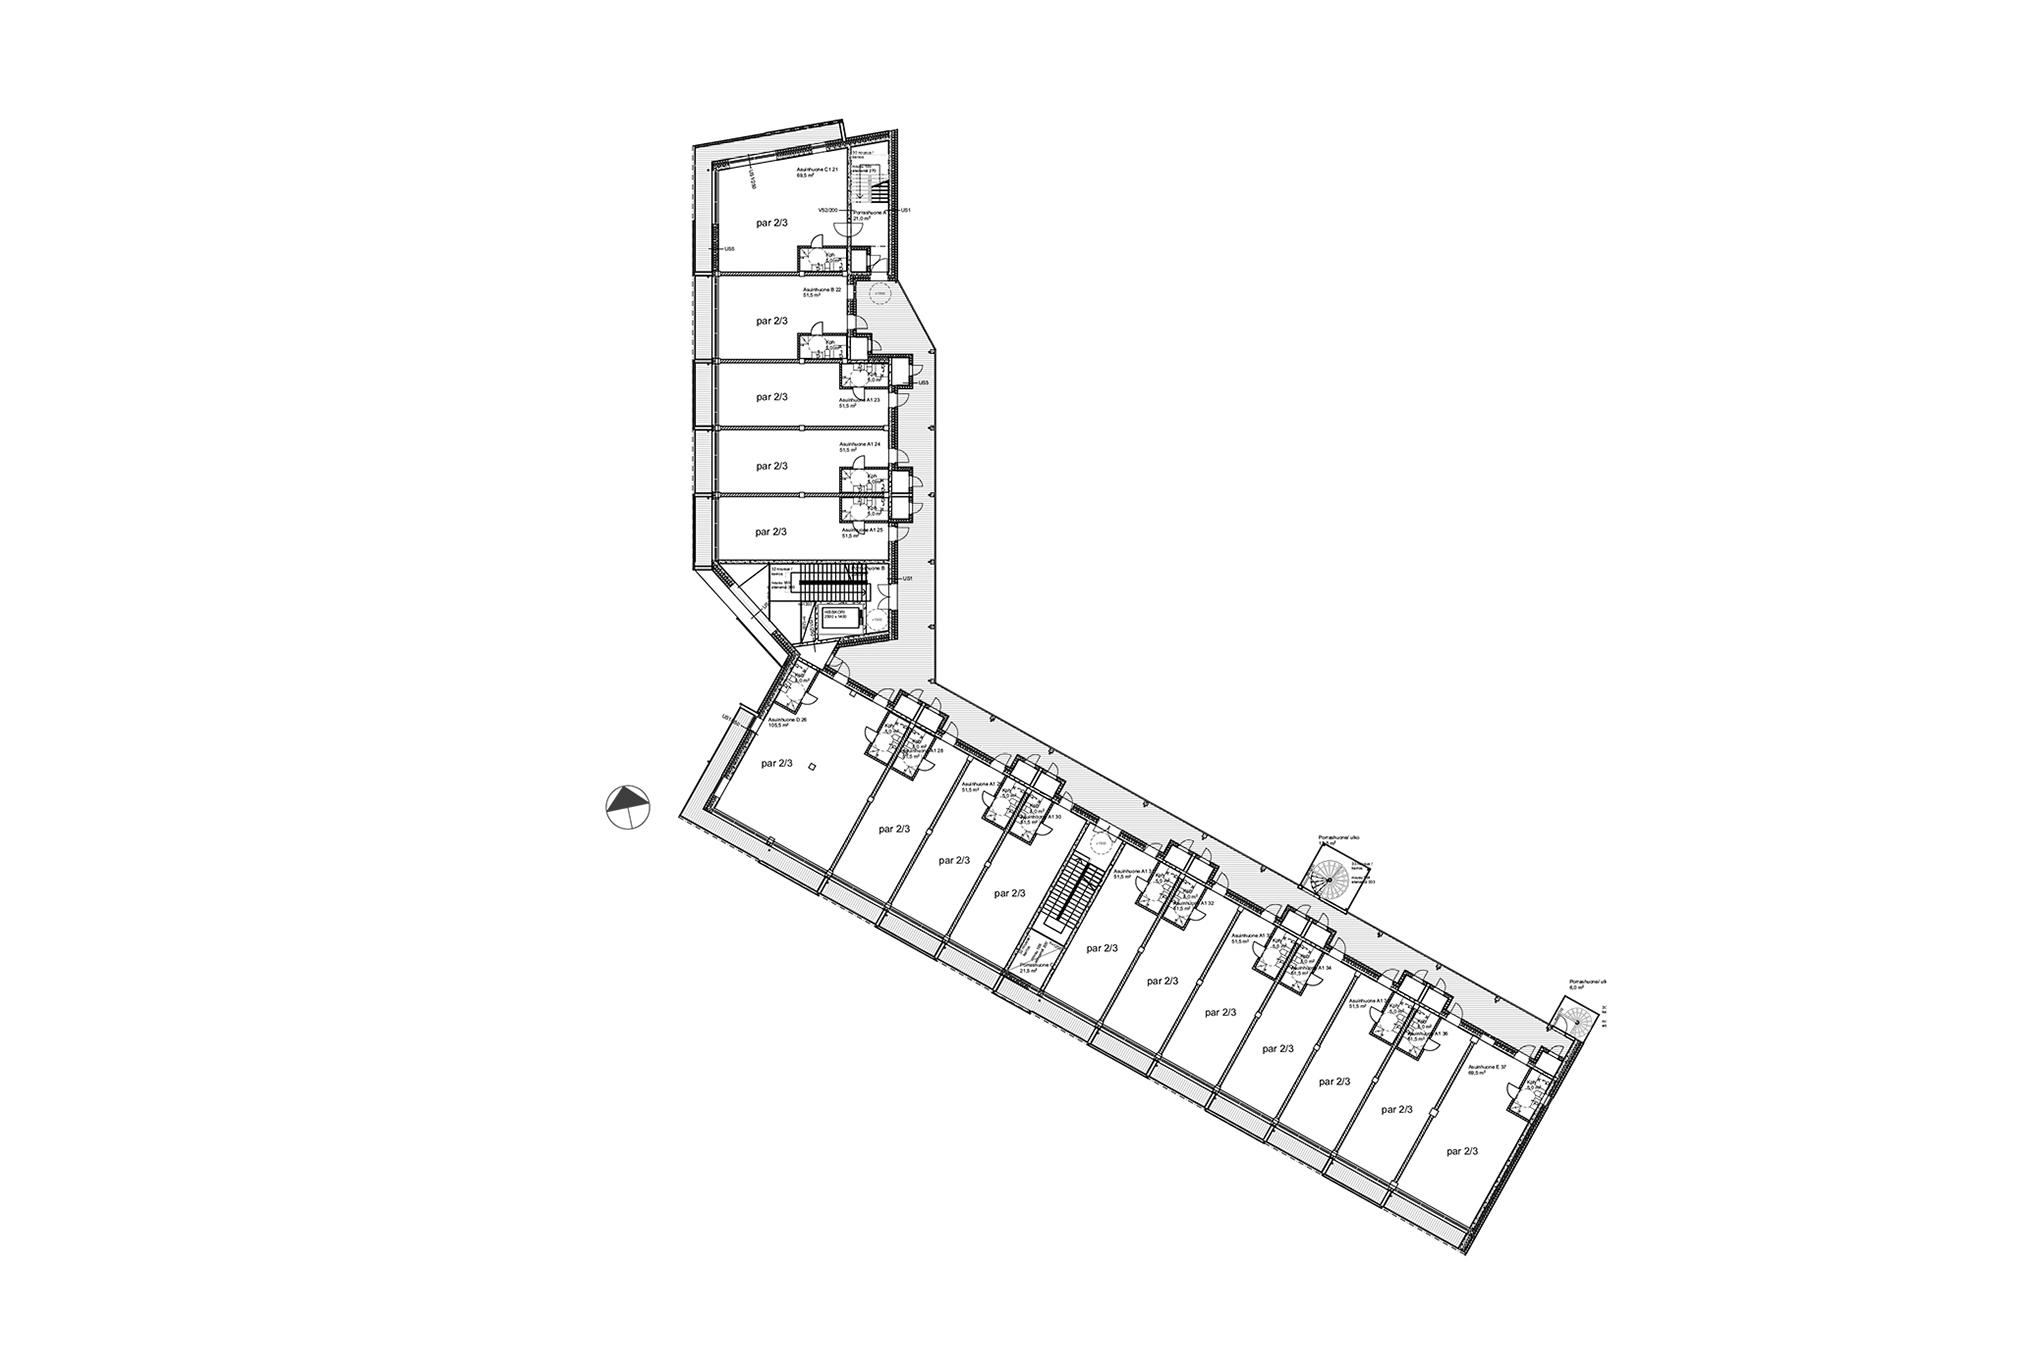 Talli Oy / Kruunuvuorenranta neo-loft apartment house, draft plan of the 3rd floor plan. Courtesy Anu Tahvanainen